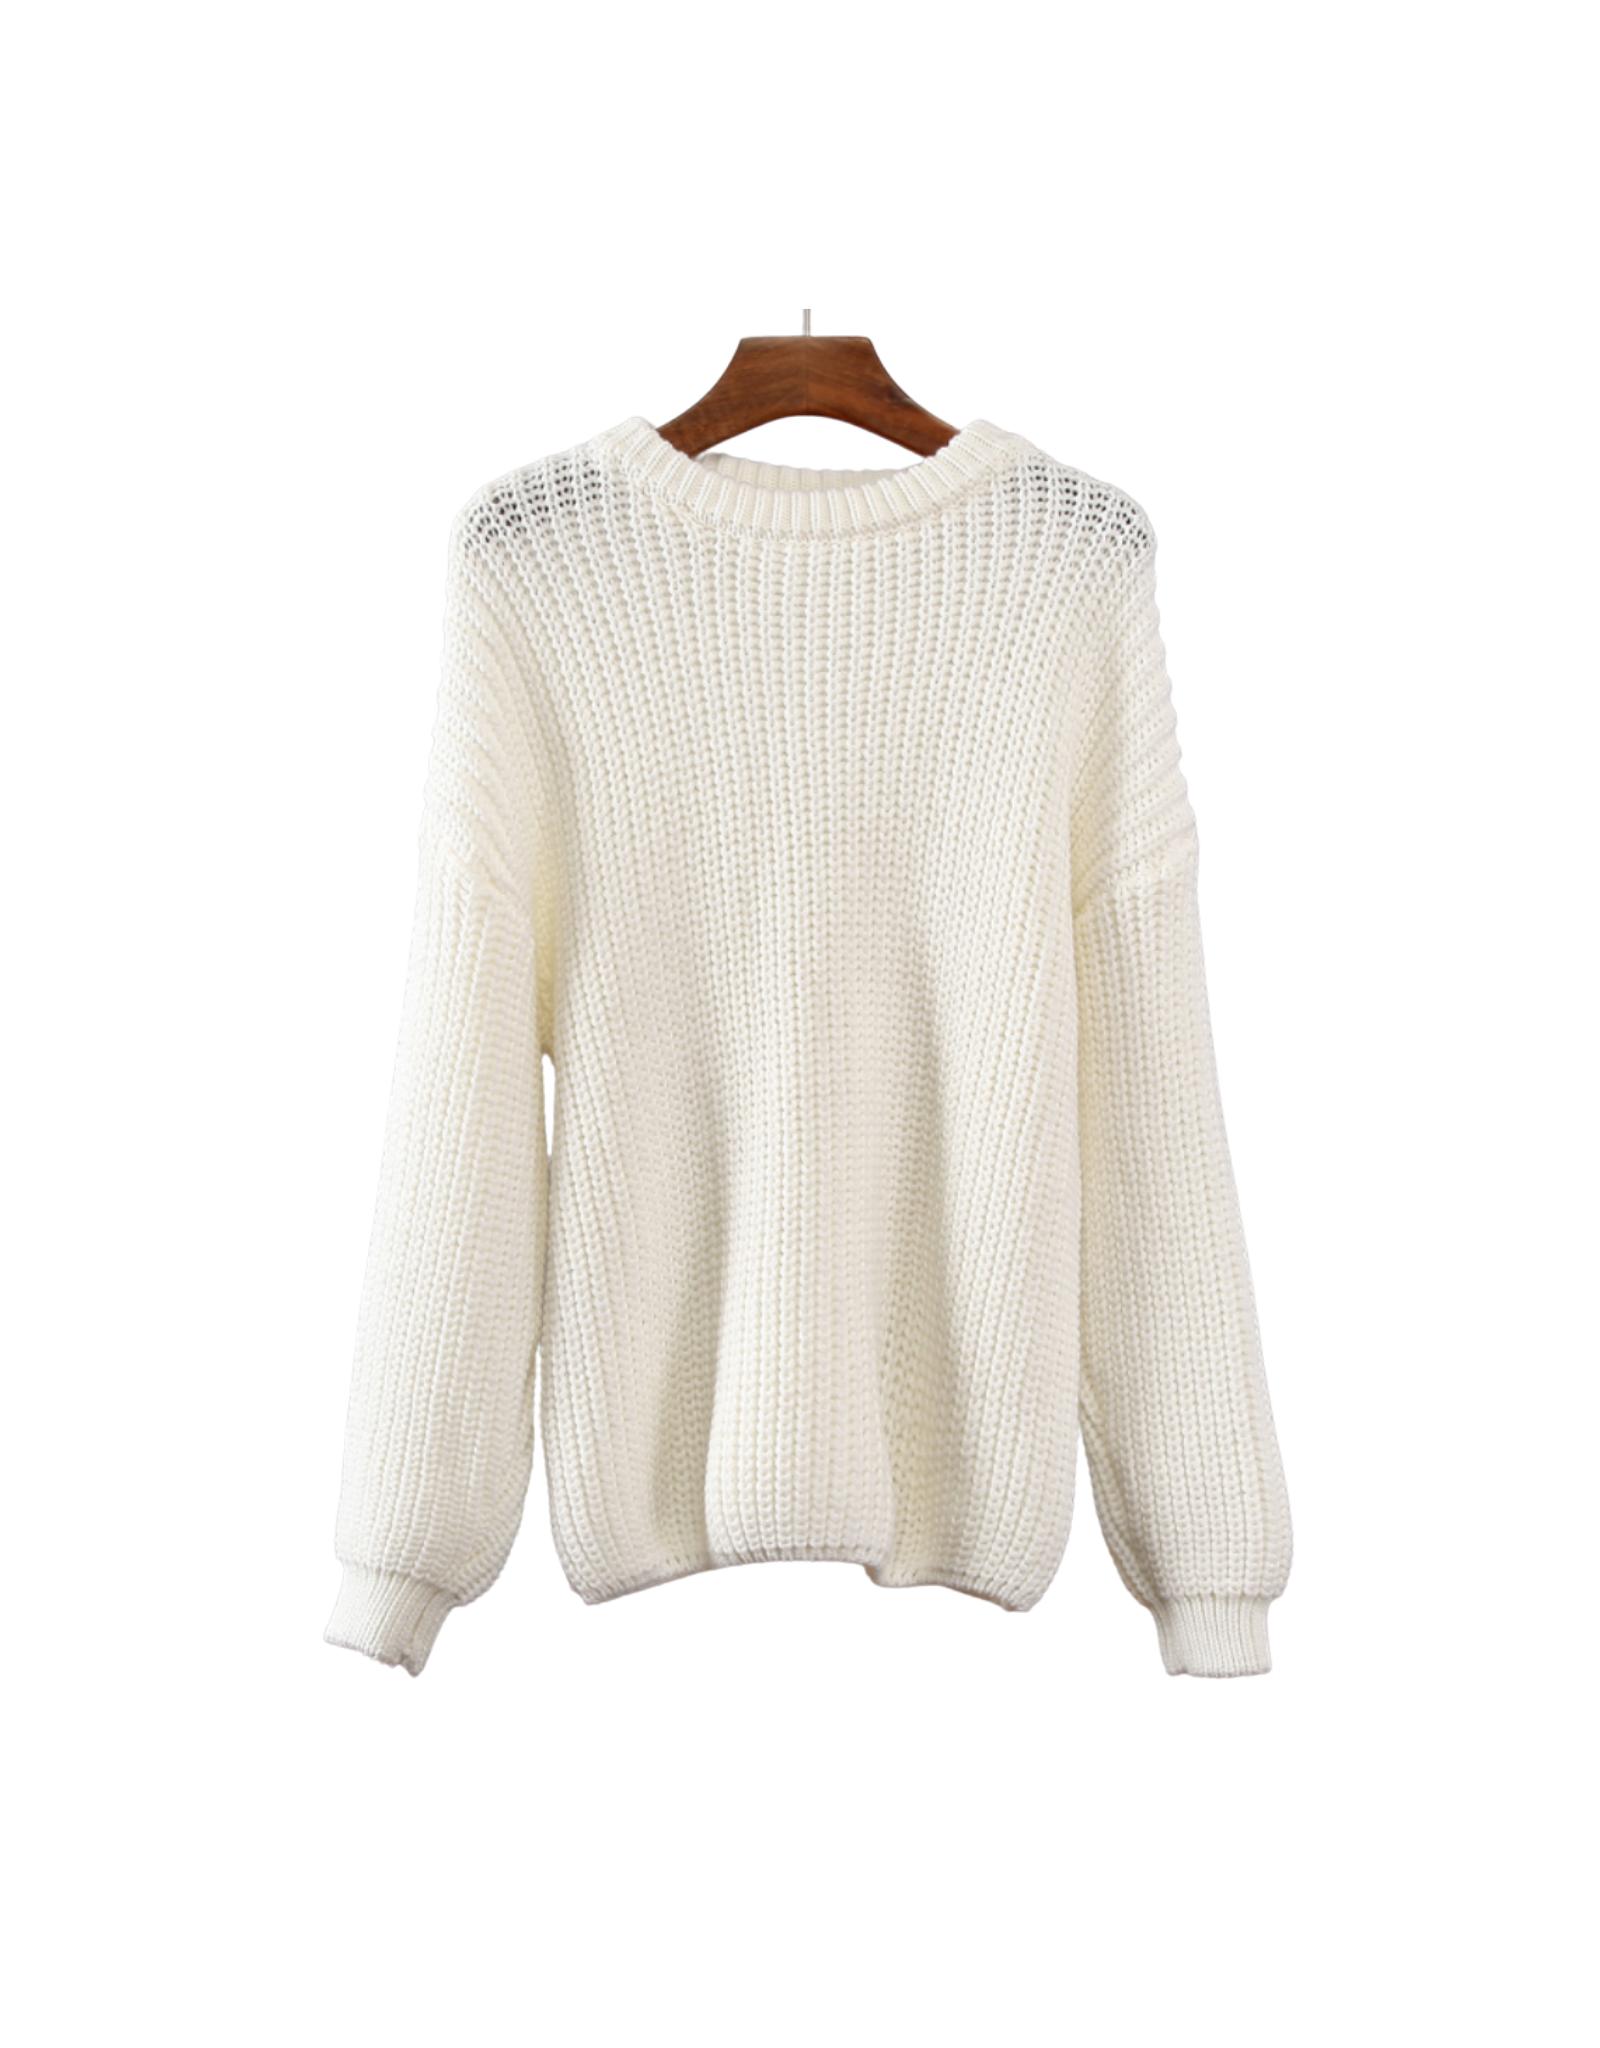 Wyld Blue Knit Sweater White